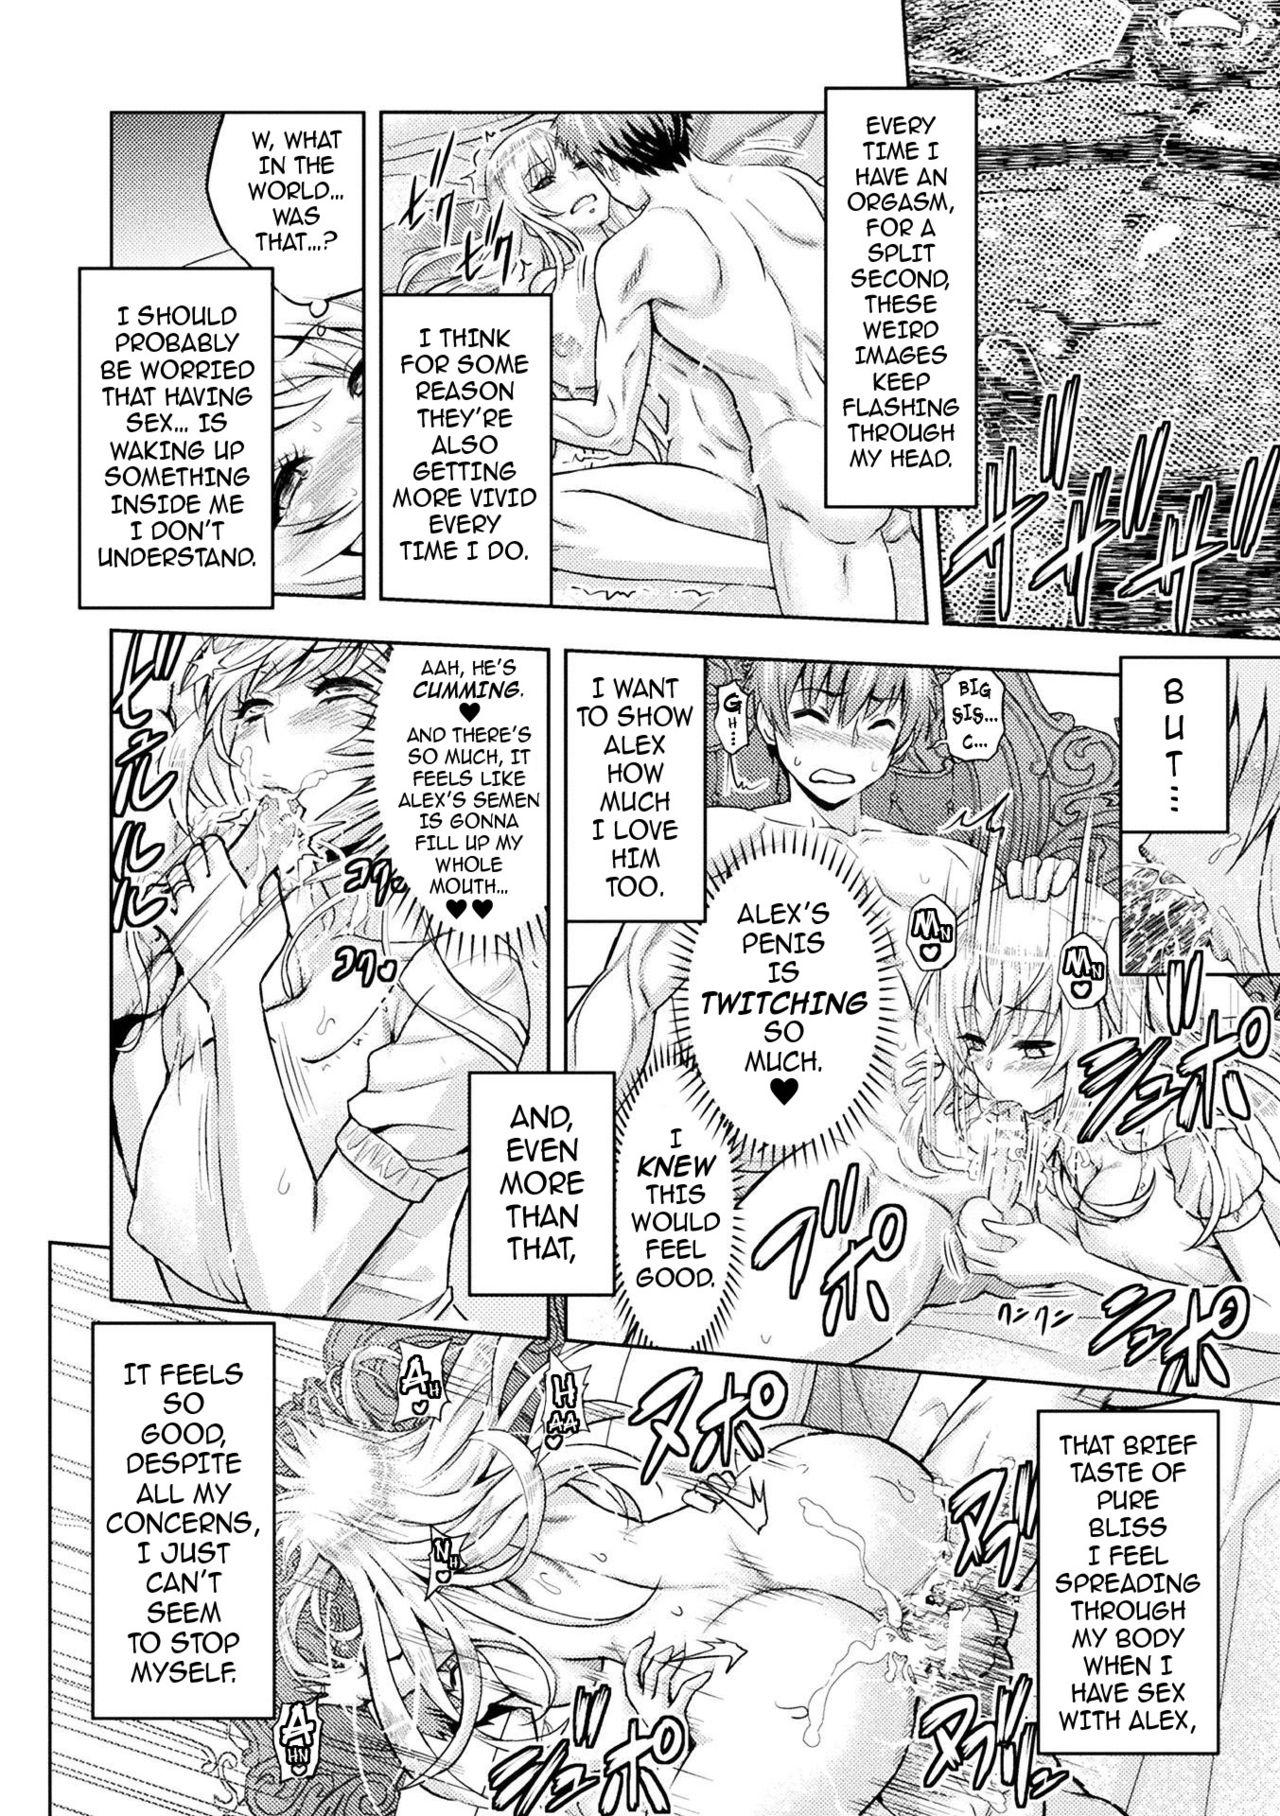 [Yamada Gogogo] Erona ~Orc no Inmon ni Okasareta Onna Kishi no Matsuro~   Erona ~The Fall of a Beautiful Knight Cursed with the Lewd Mark of an Orc~ Ch. 1-6 [English] {darknight} 142